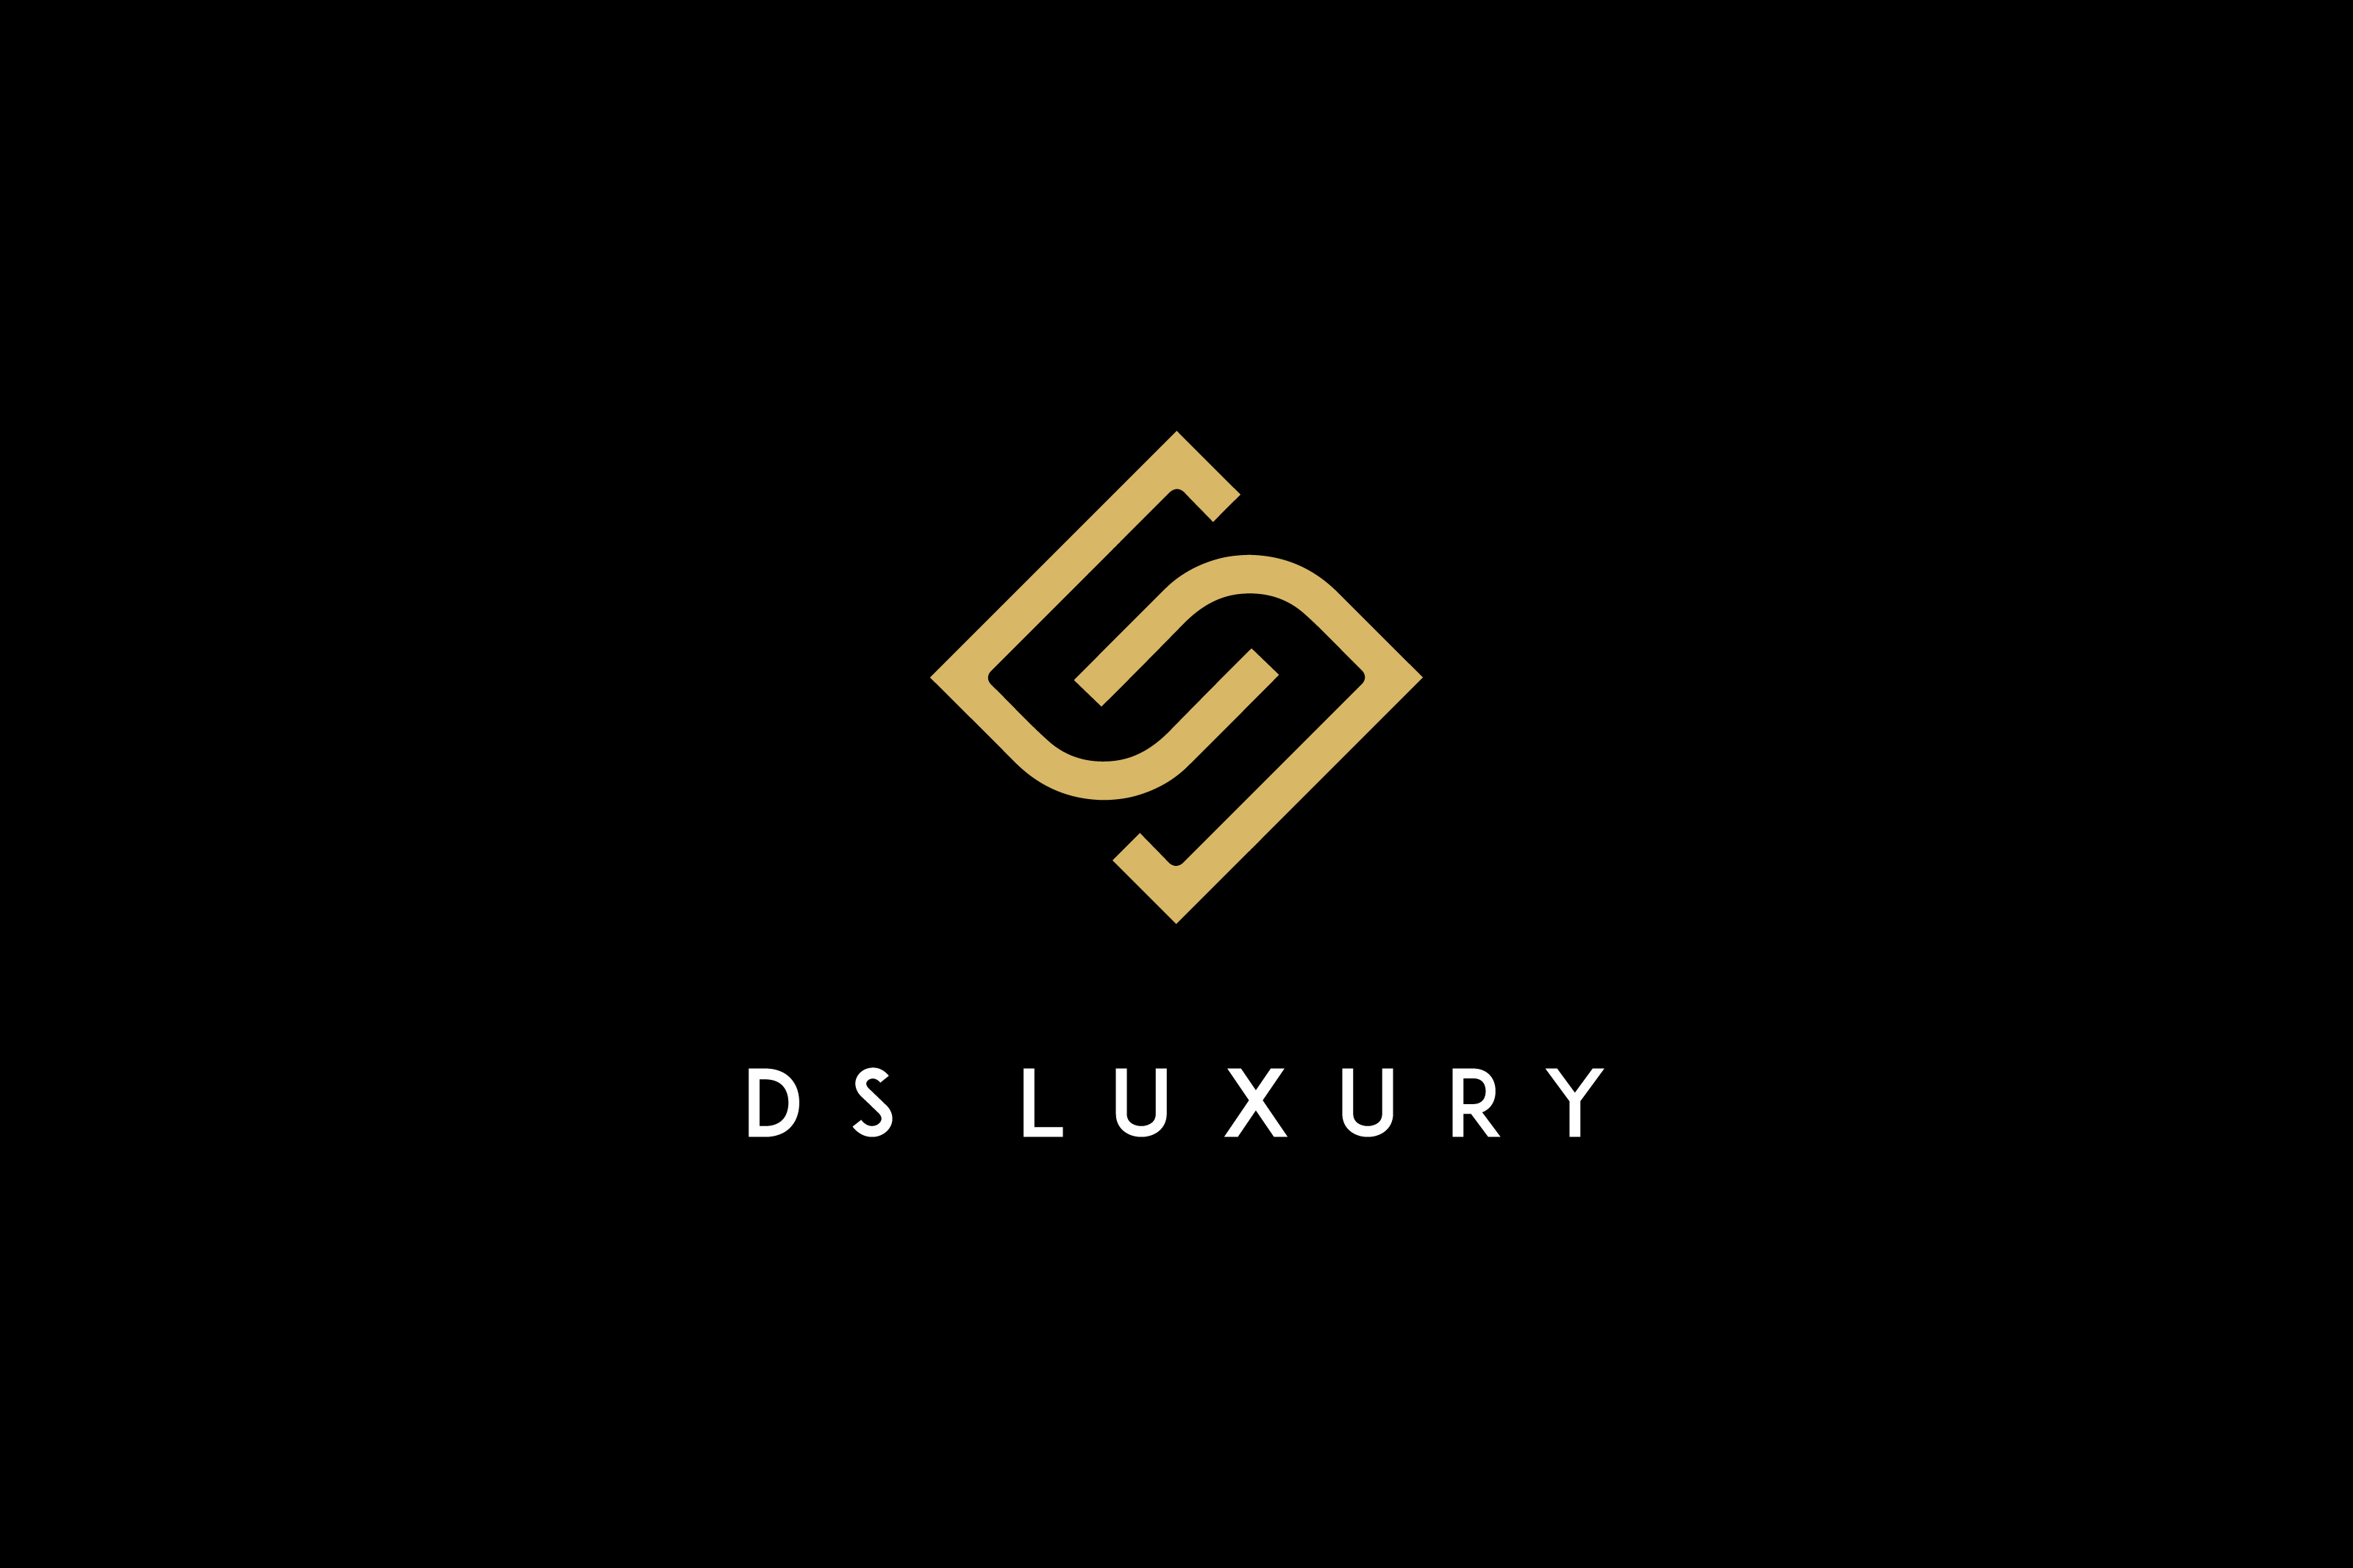 THIẾT KẾ LOGO ĐỒNG HỒ DS LUXURY